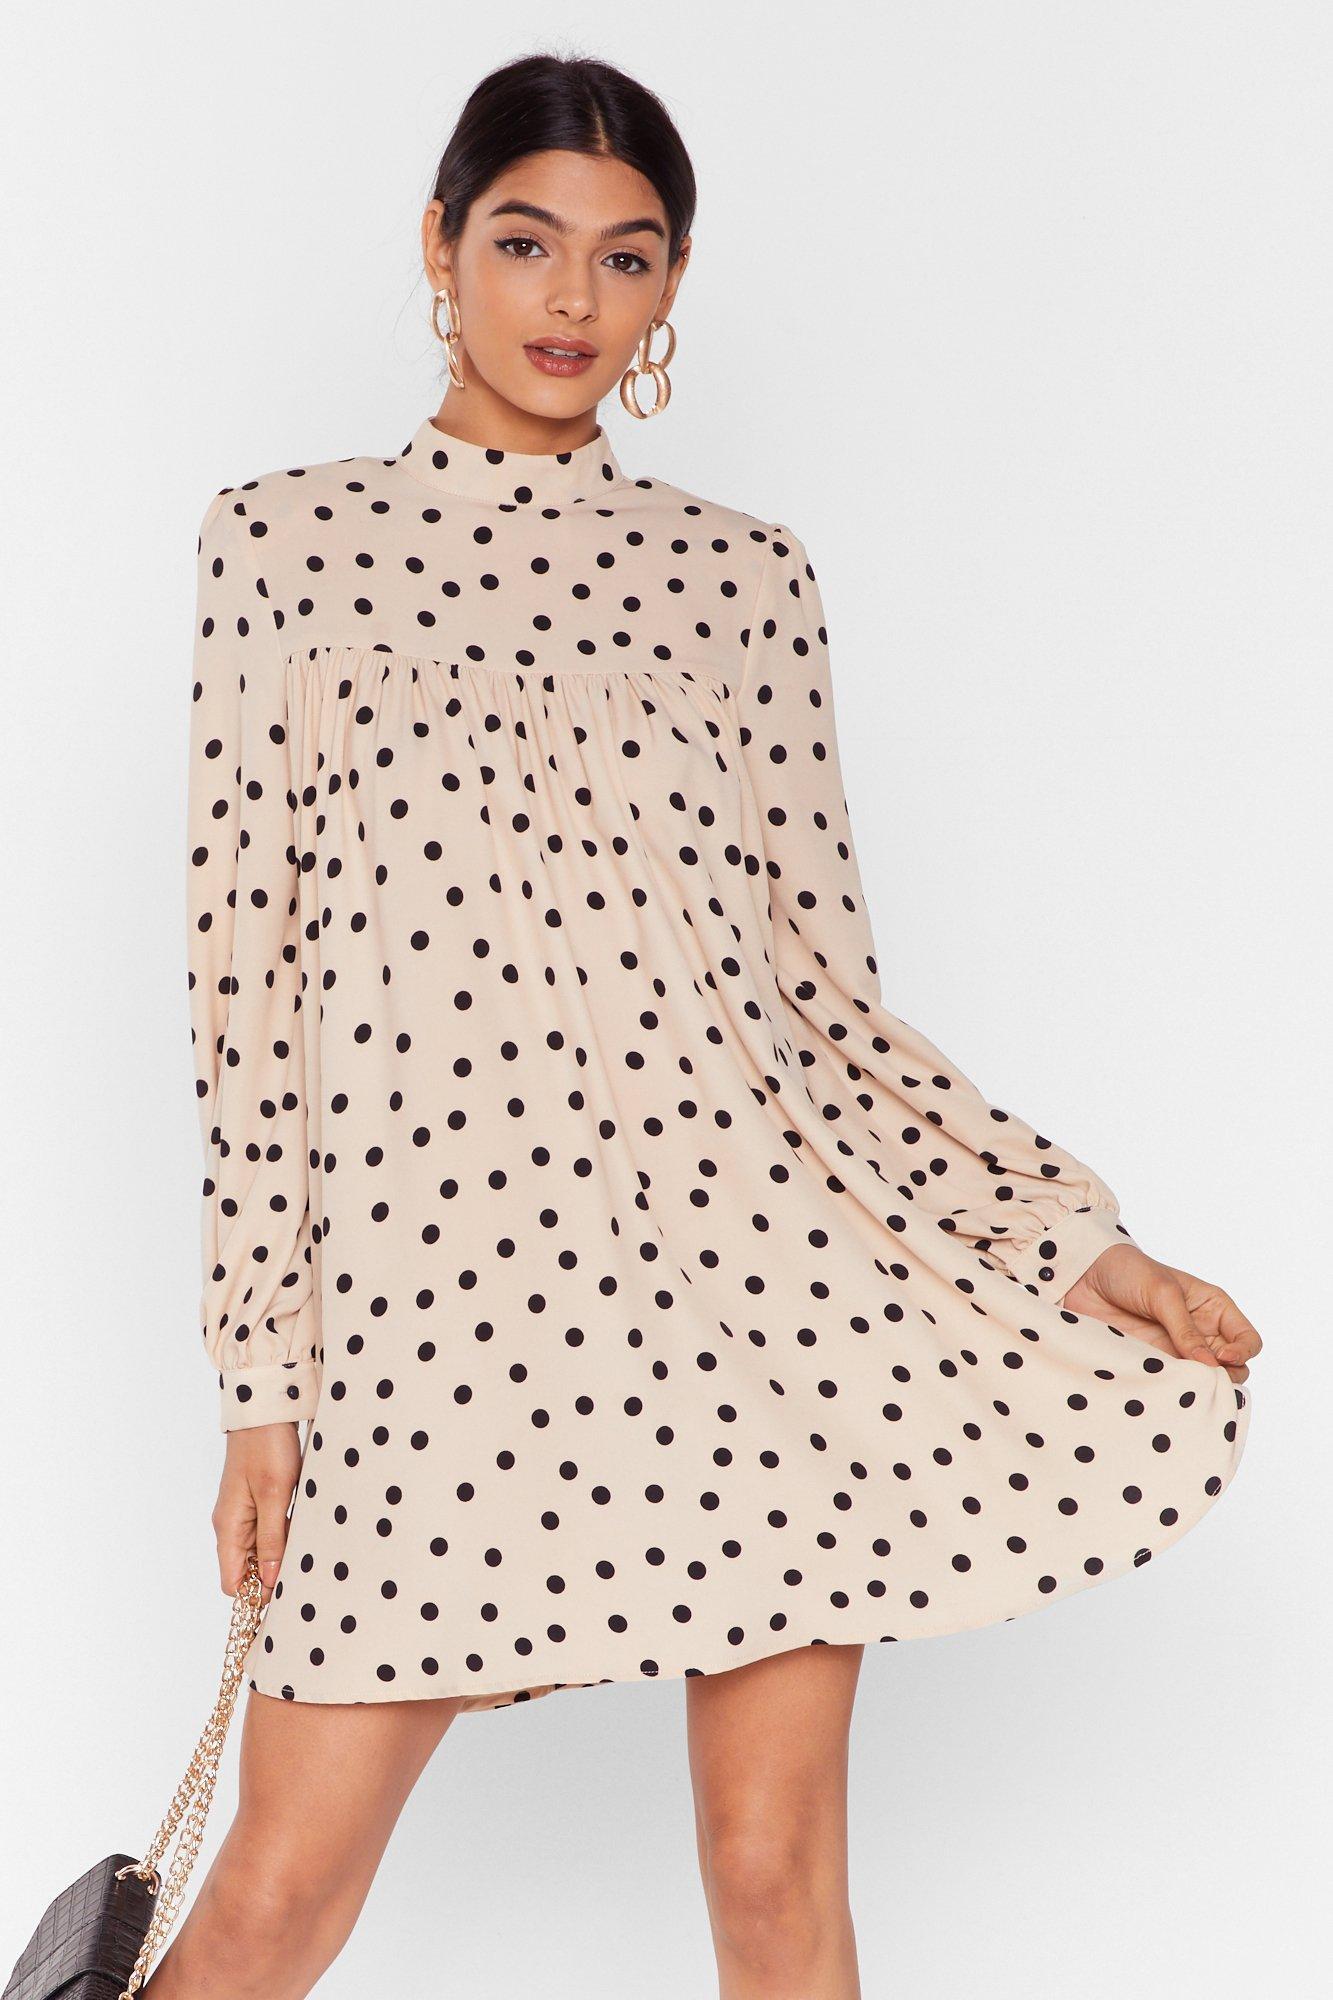 Got a Smock to Say Polka Dot Mini Dress